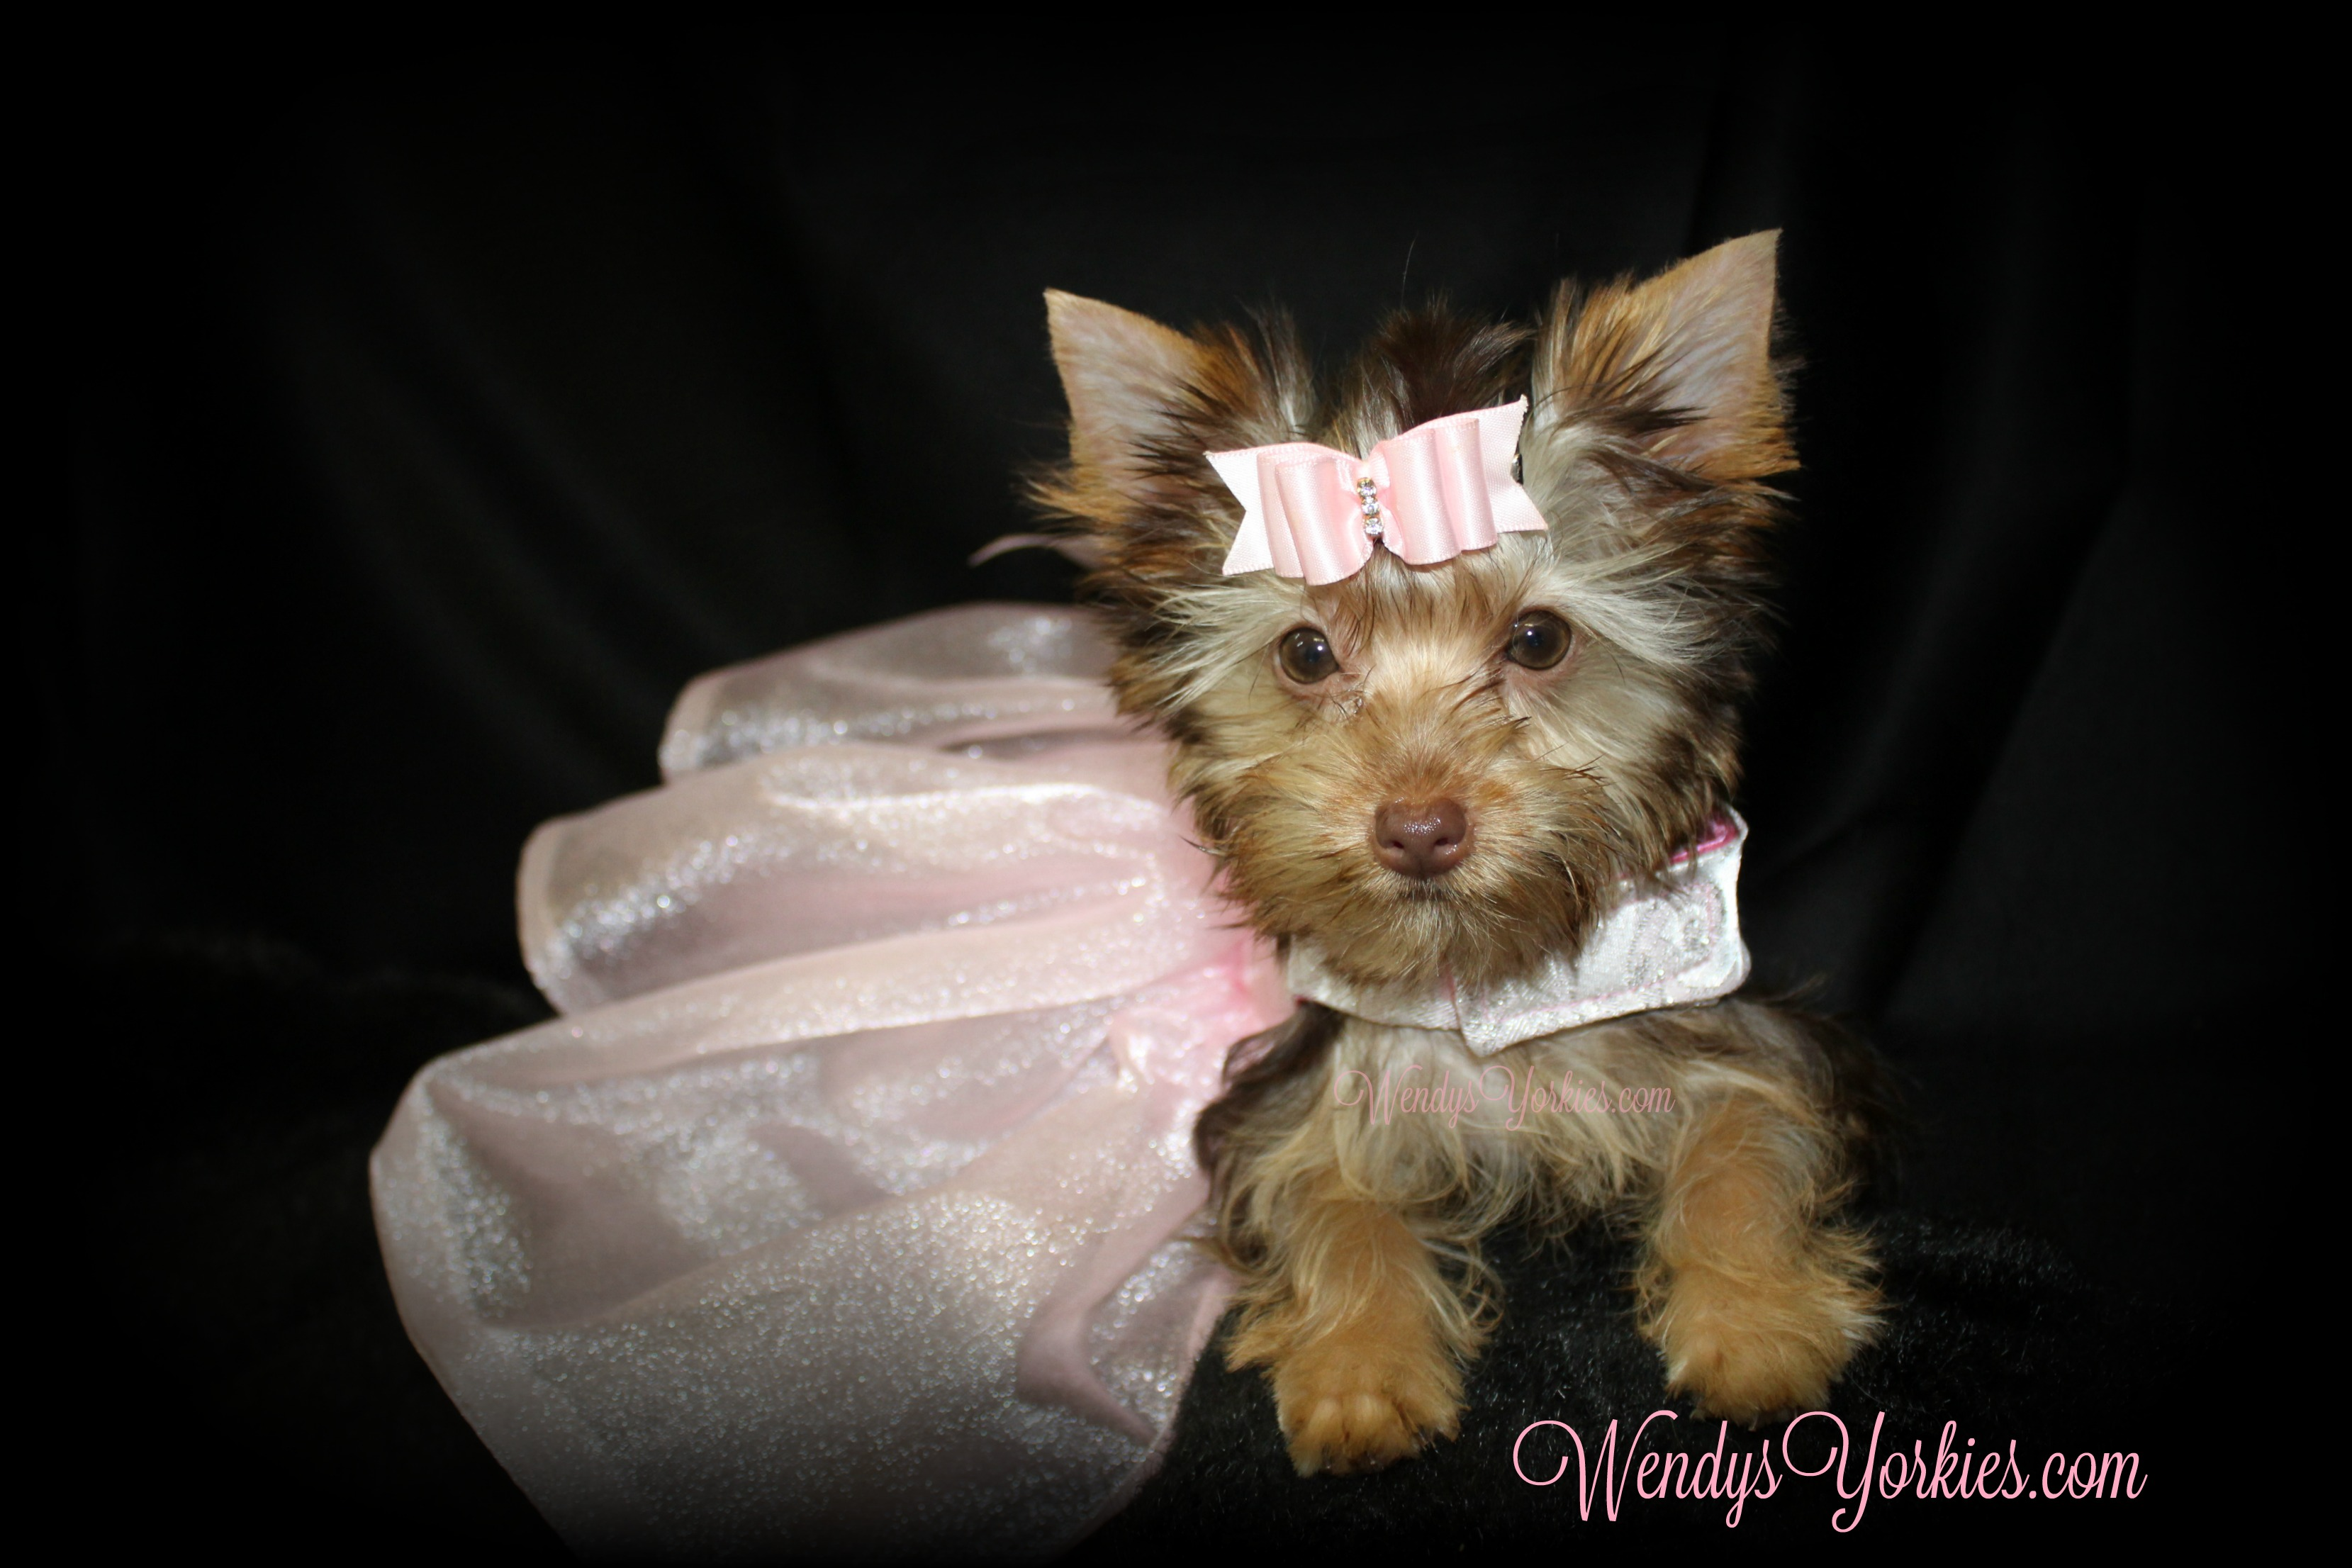 Tiny Chocolate Yorkie puppy for sale, WendysYorkies.com, Daisy cf